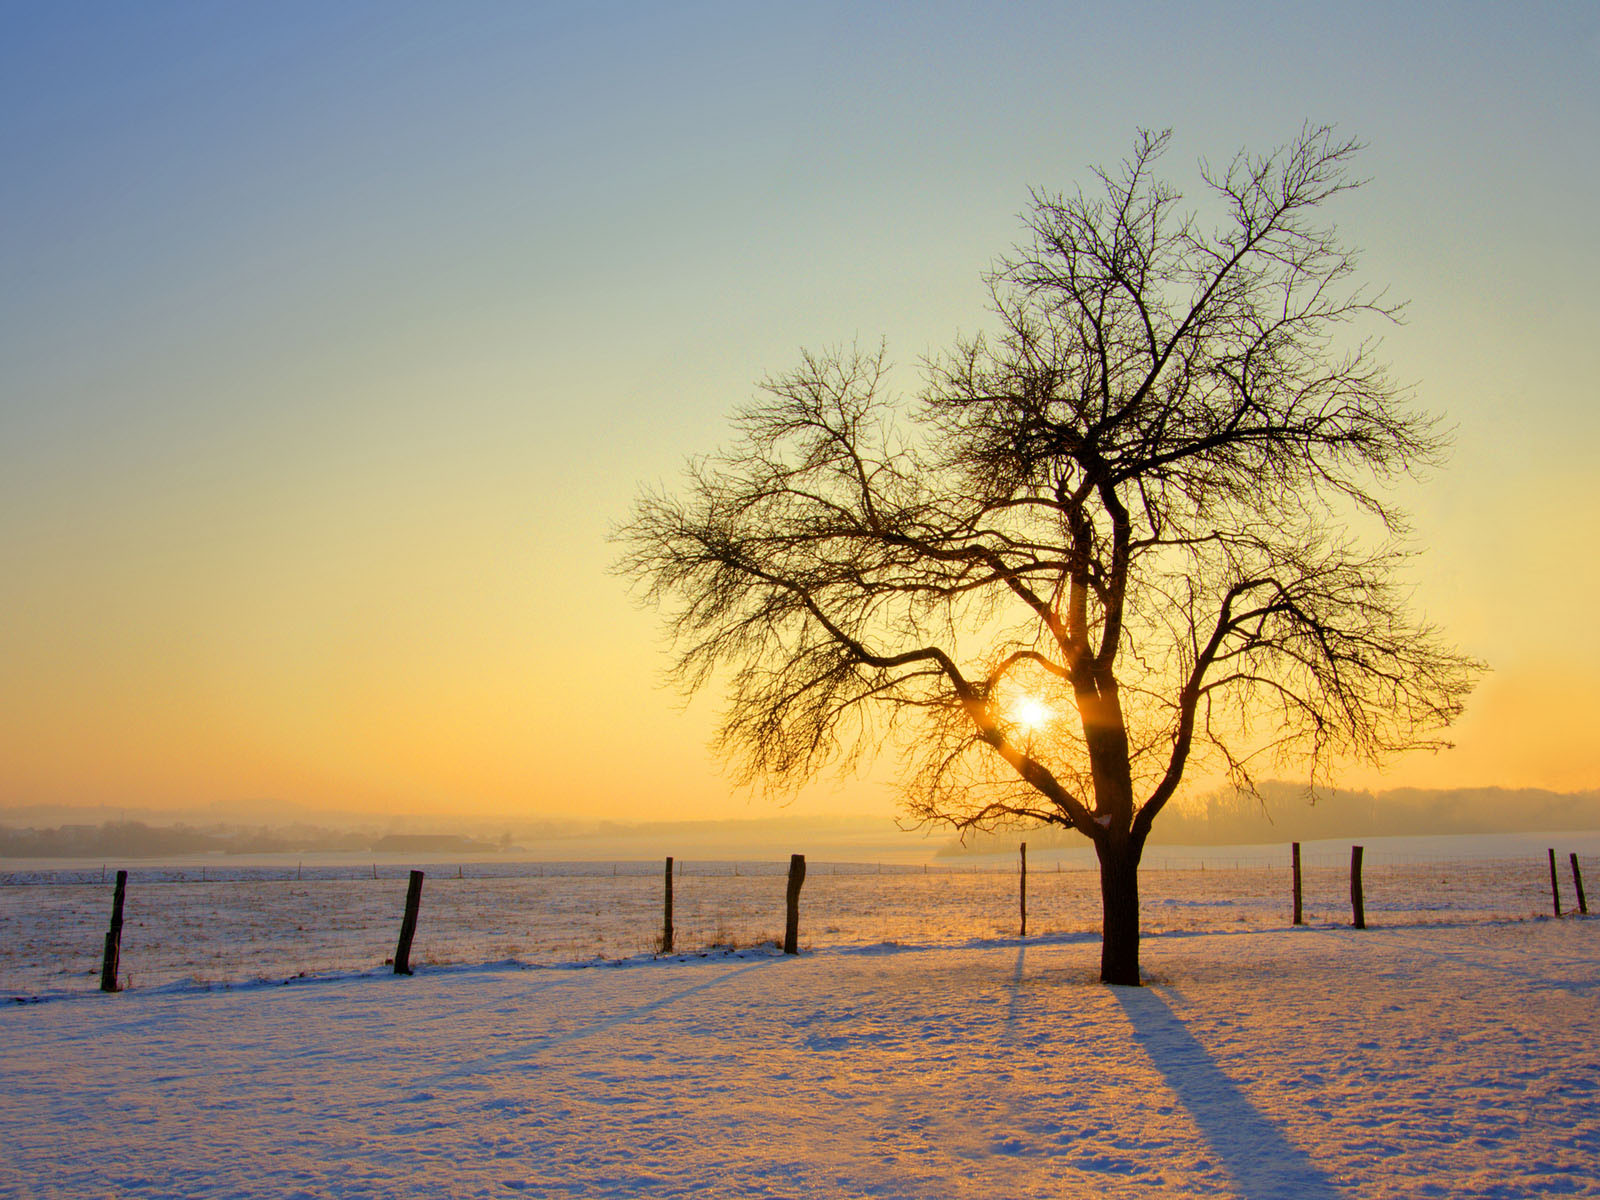 zimsko jutro sastav iz srpskog jezika